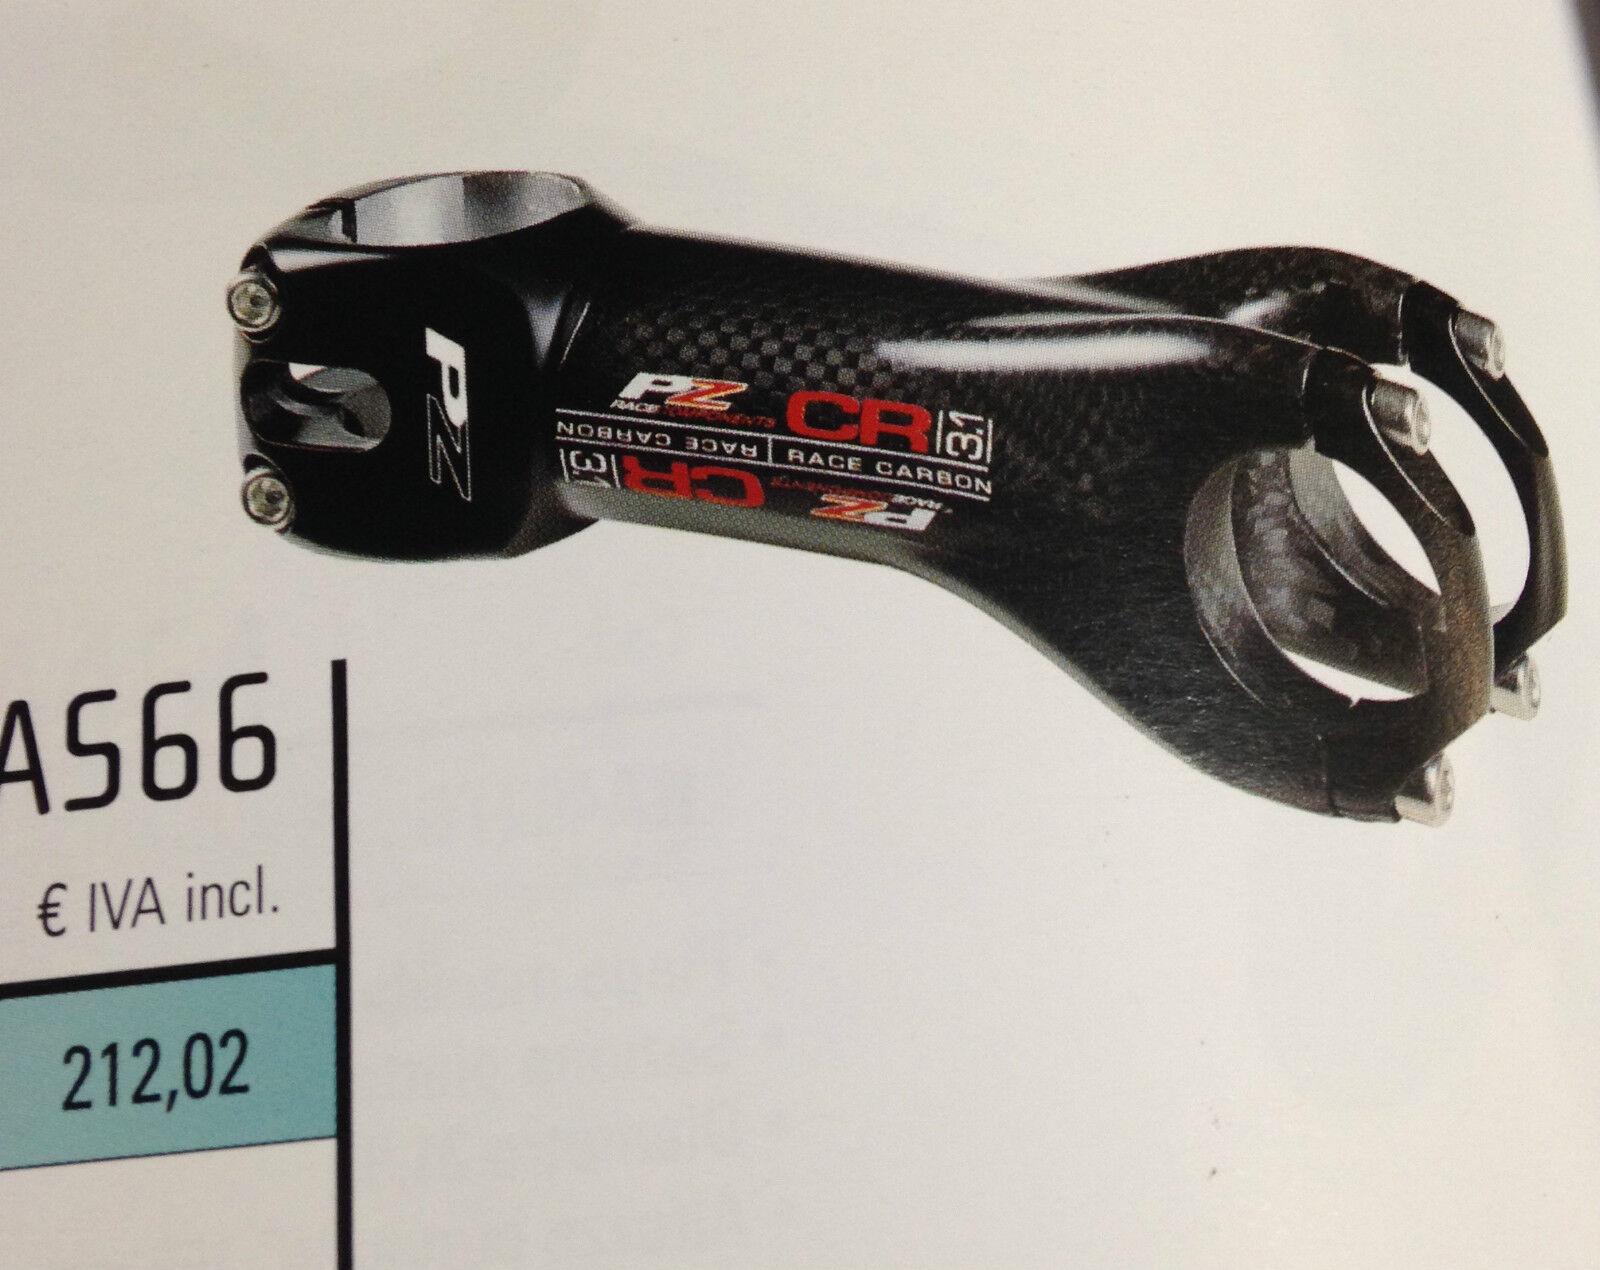 Stem bike race PZ CR 3.1 Carbon Bike Stem Full  Carbon 90-130  save up to 70%